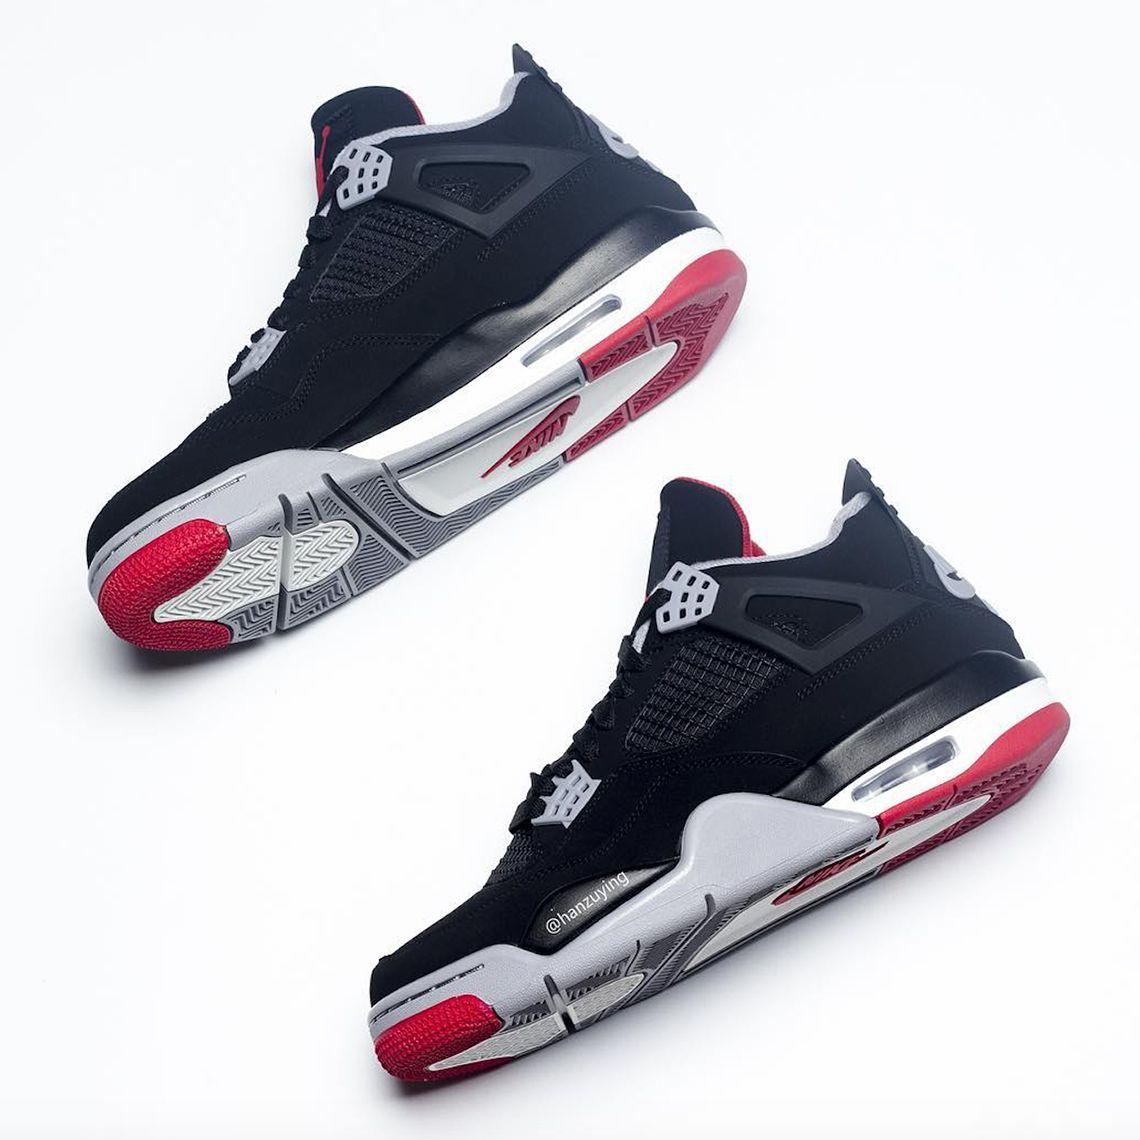 sneakers for cheap 3cb2e b5840 Jordan 4 Bred 2019 308497-060 Release Date   SneakerNews.com